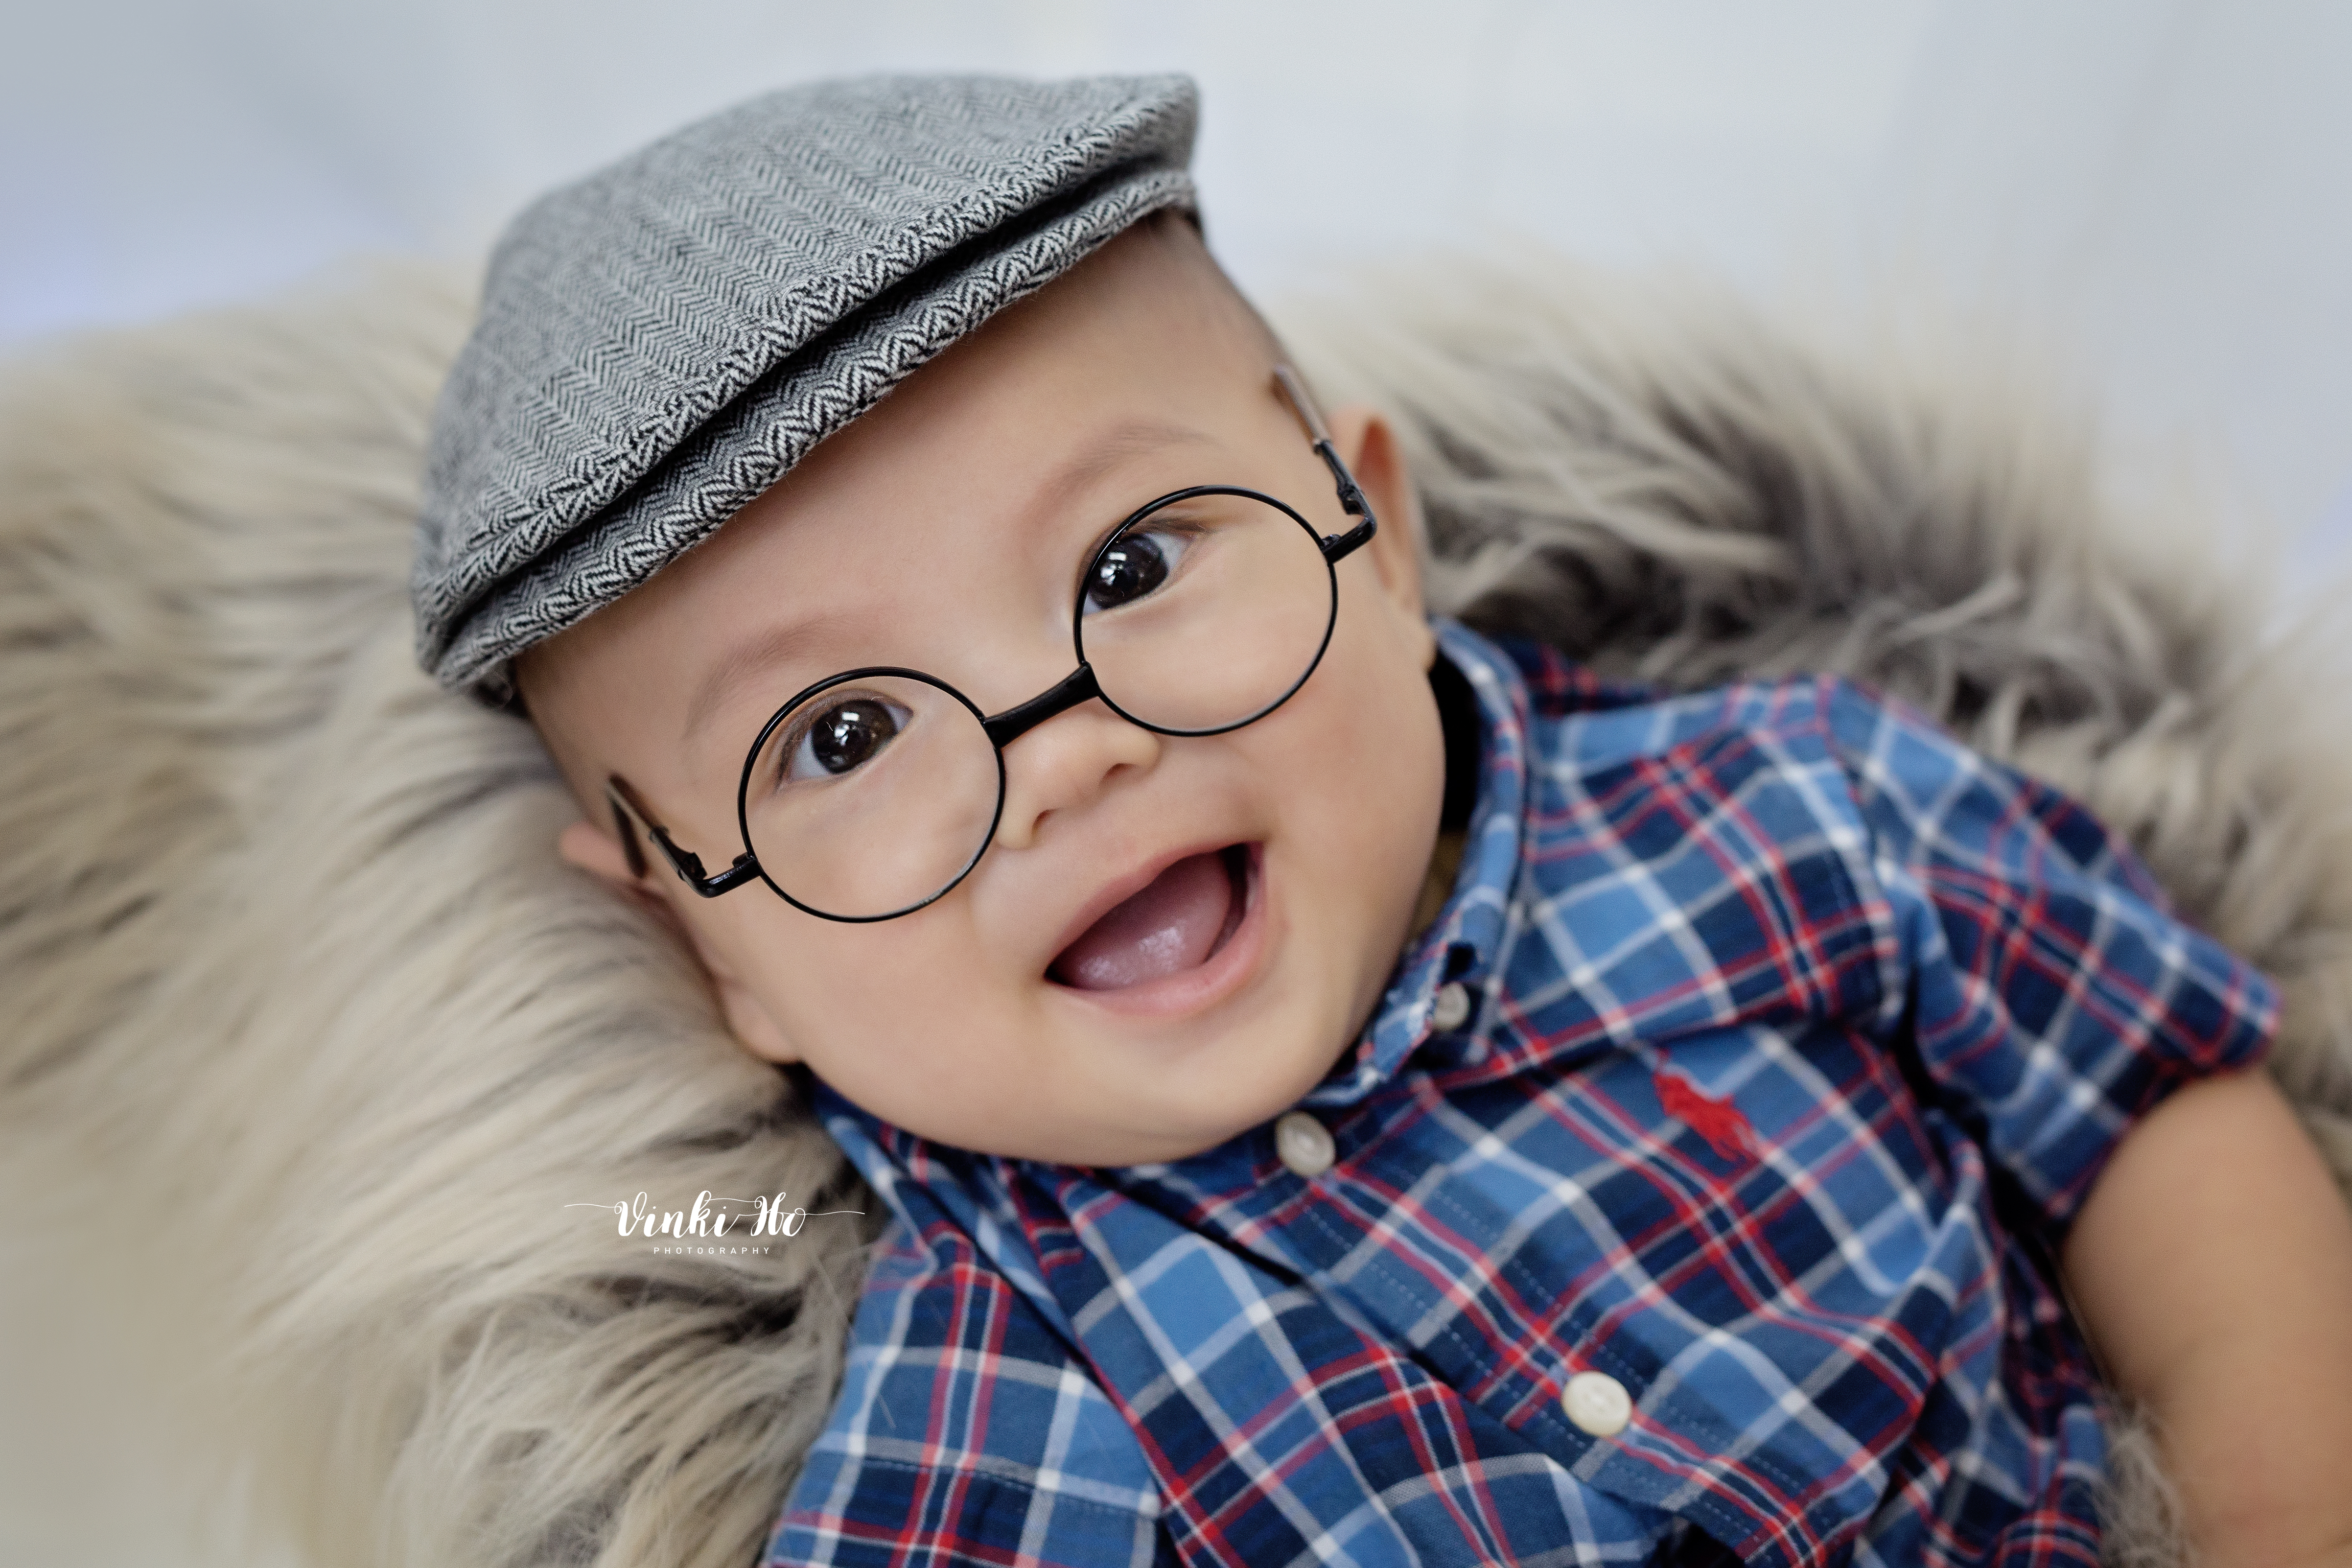 Studio_Baby Dominic 3mths old